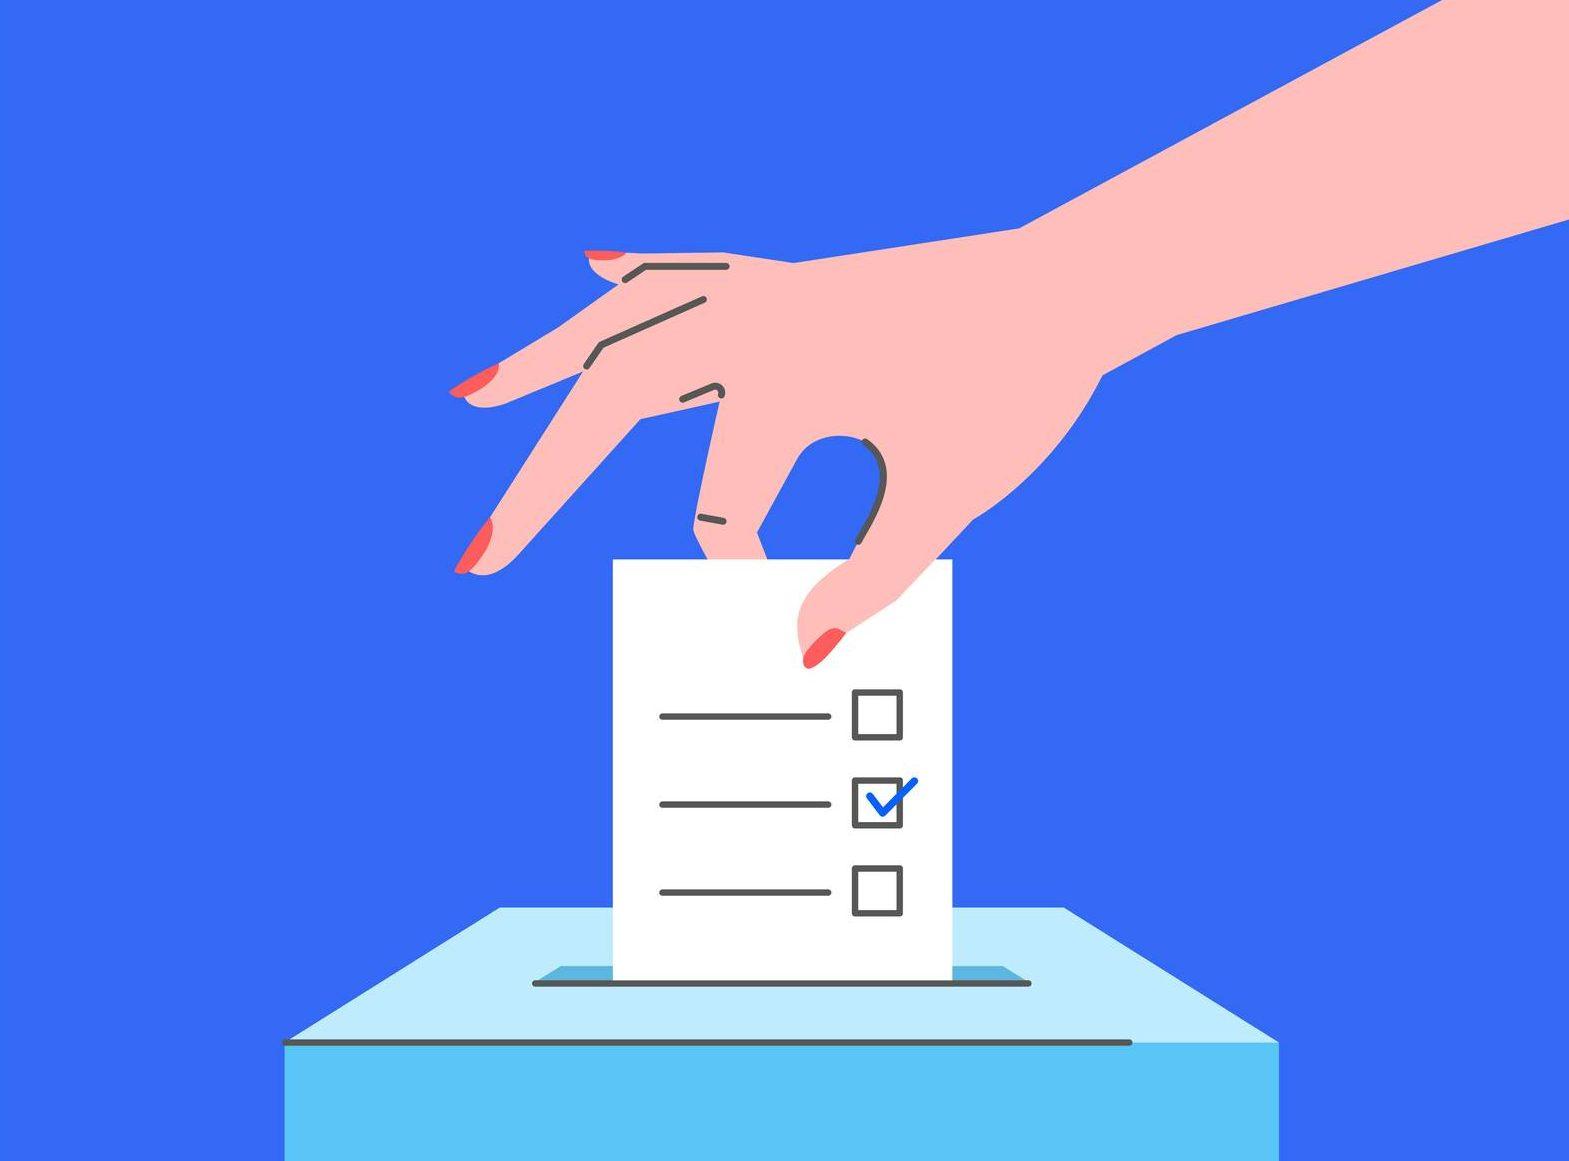 www.juicysantos.com.br - vote em mulheres